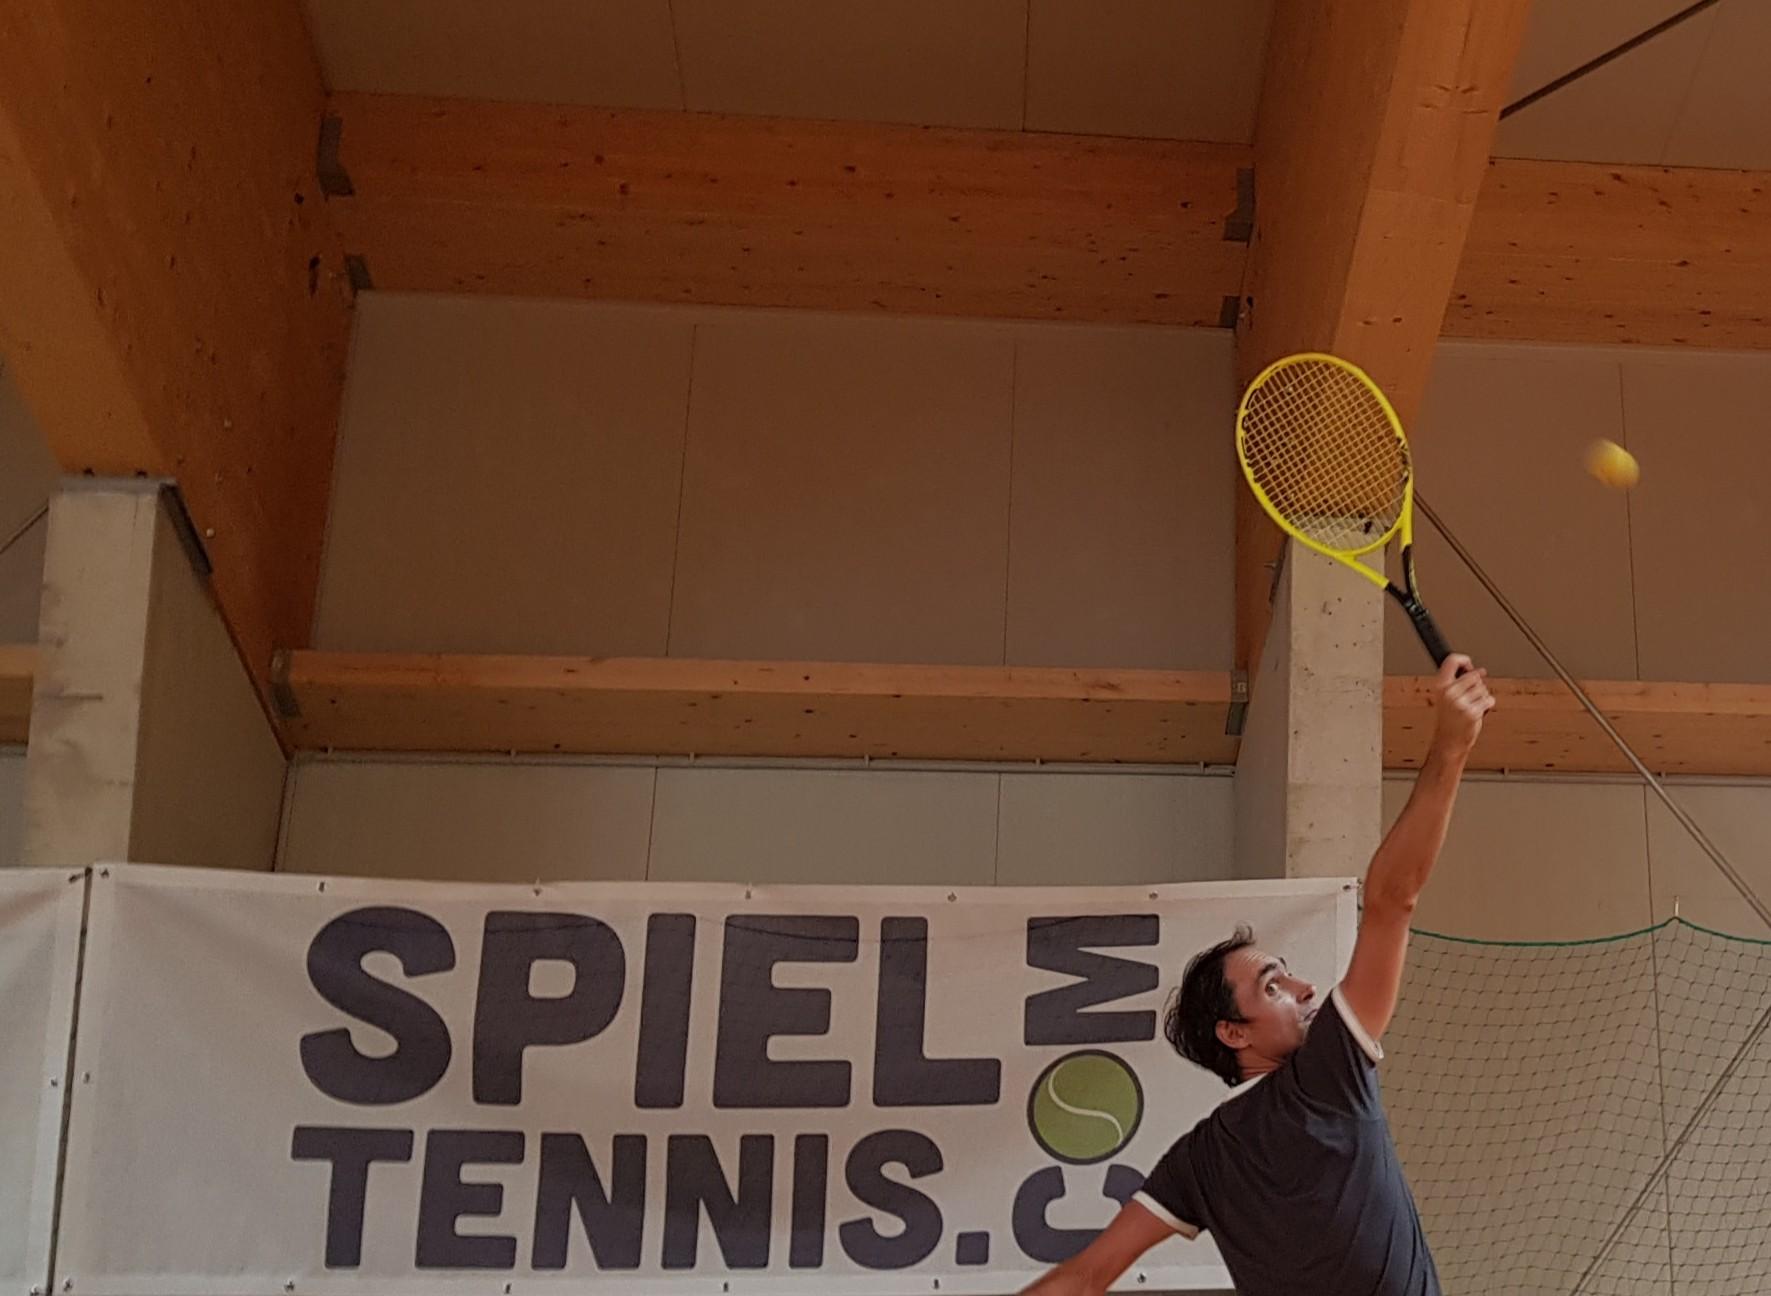 Tennislehrer zeigt Rückhandsmash